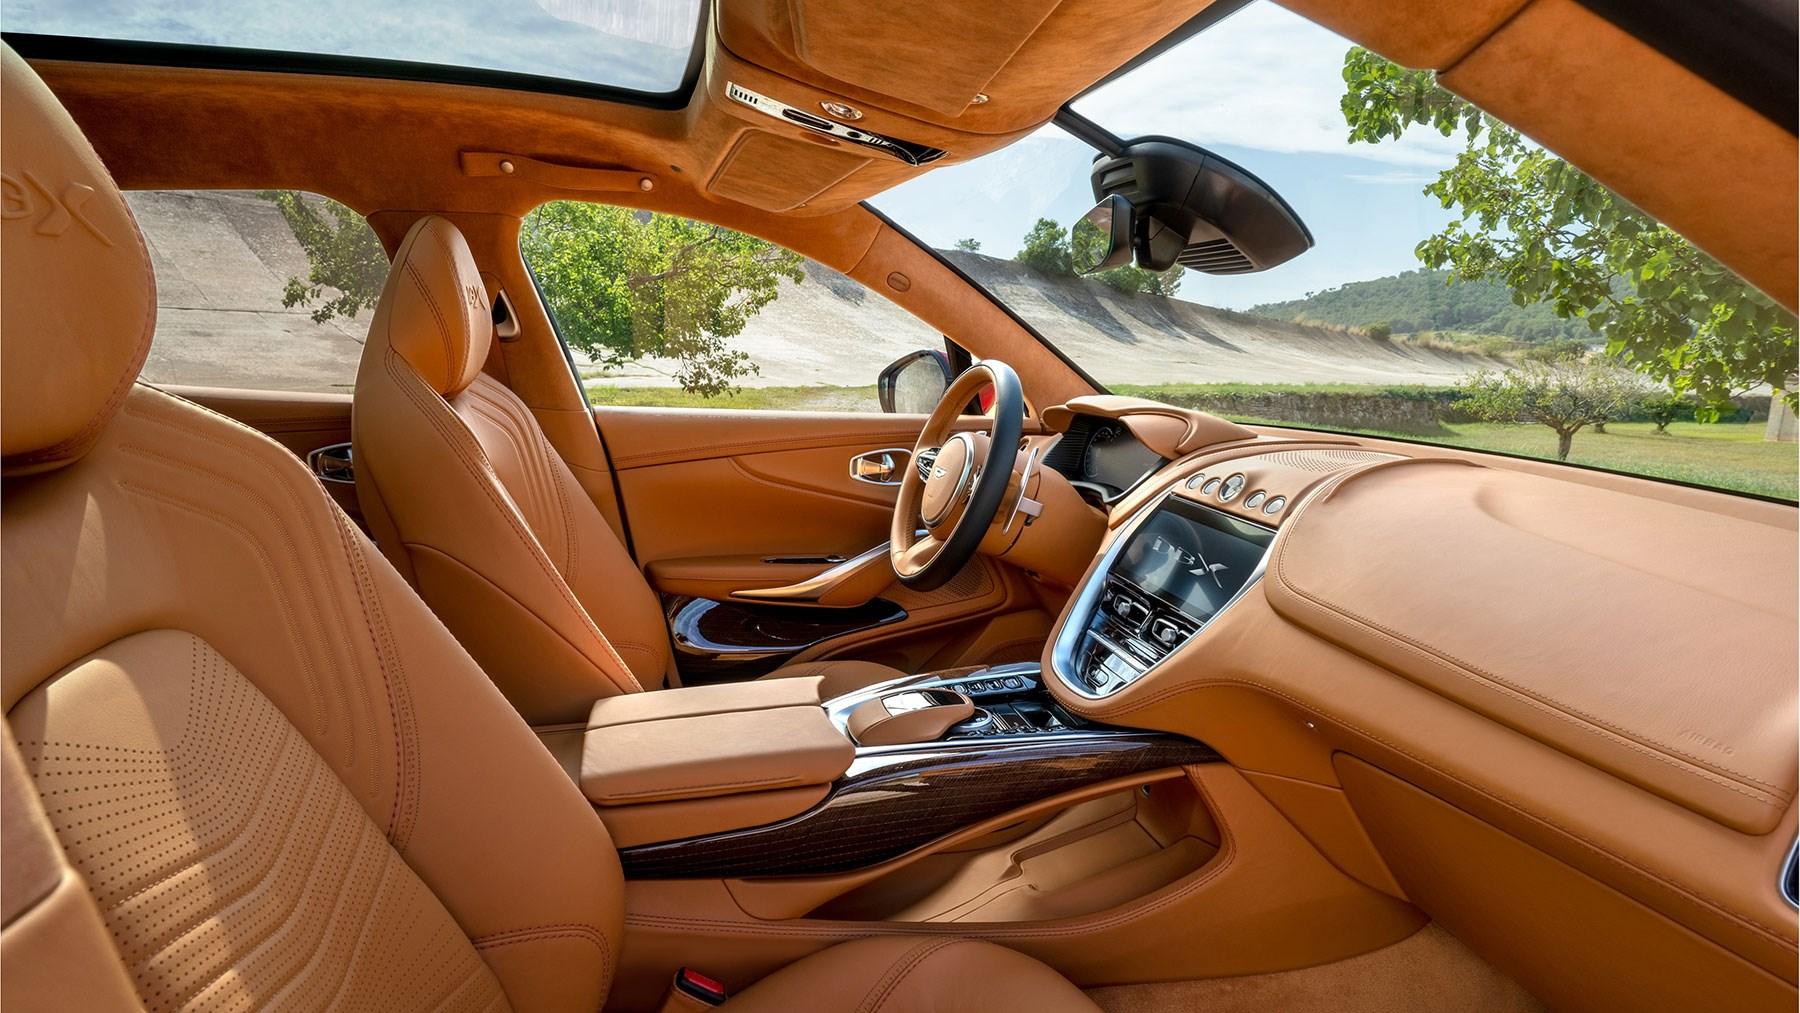 Aston Martin Dbx First Suv Rolls Off Production Line Car Magazine